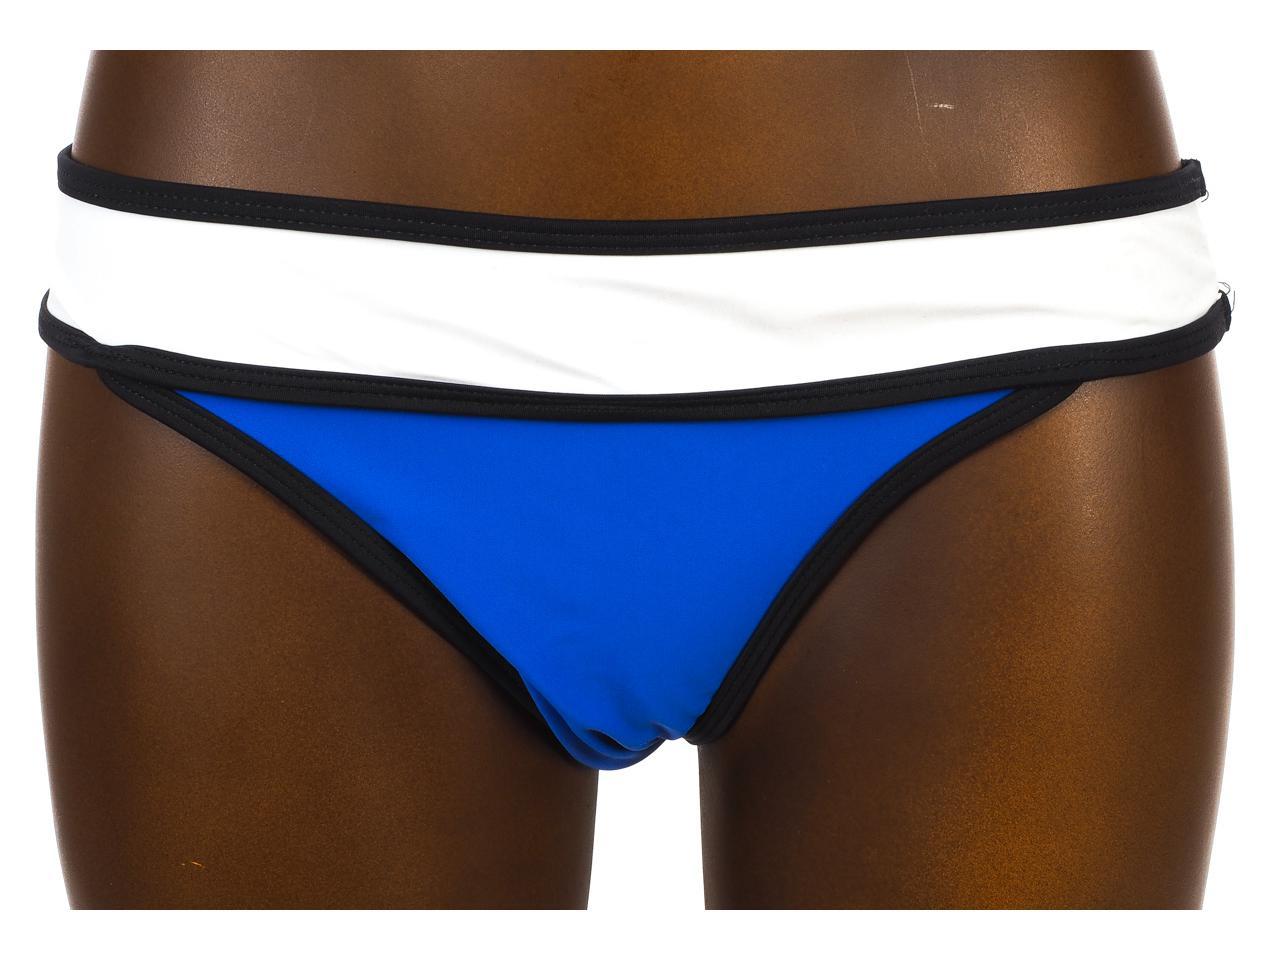 Maillot-de-bain-2-pieces-Culture-sud-Appa-royal-2p-Bleu-79870-Neuf miniature 3